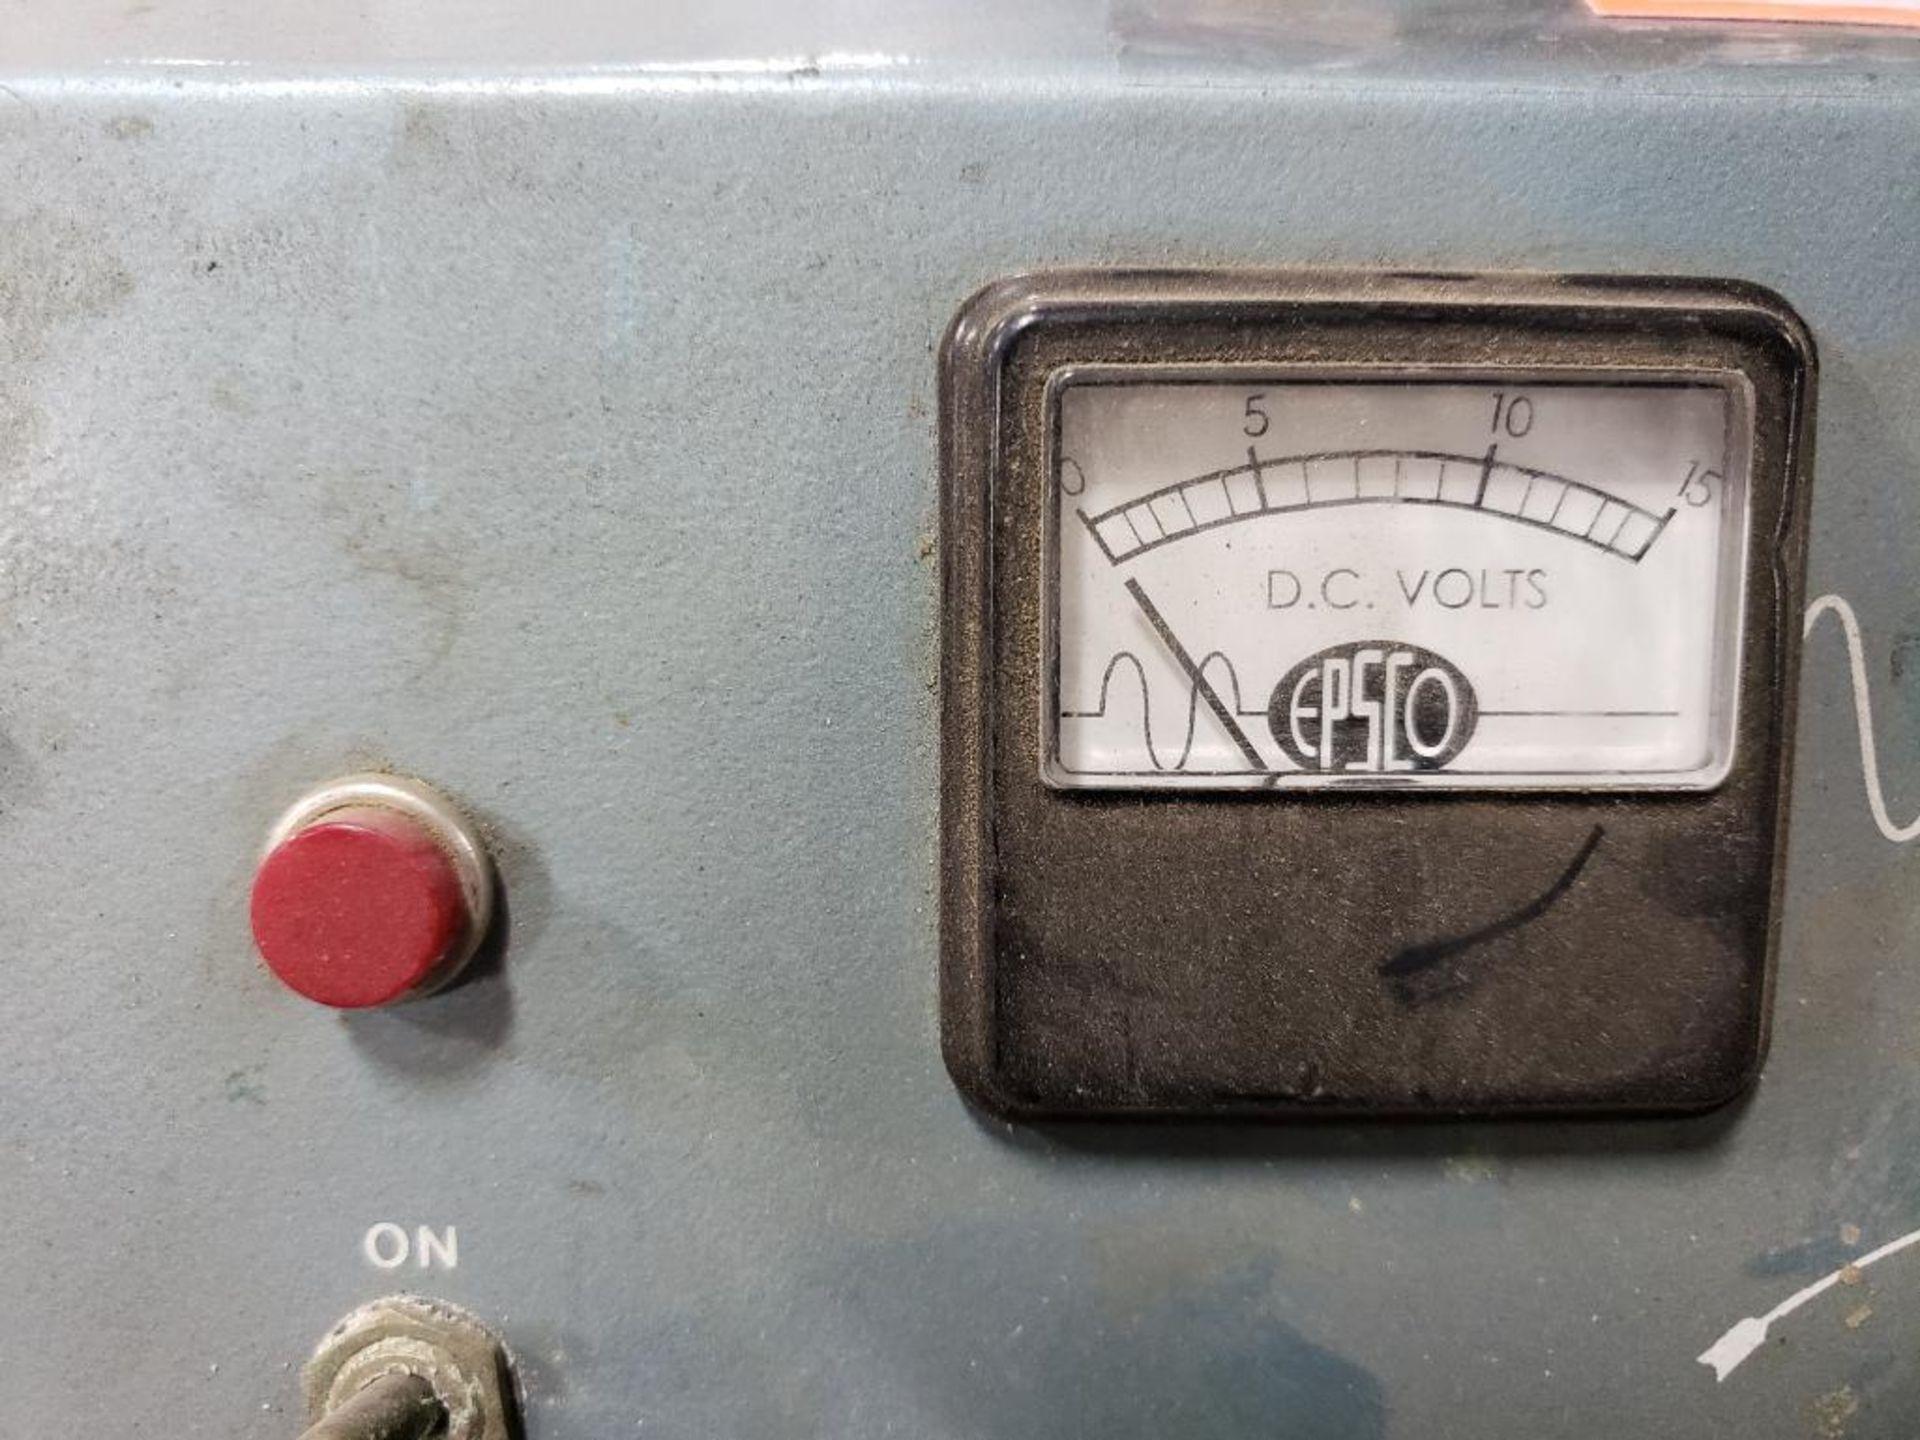 EPSCO DC Volt Meter. - Image 4 of 7